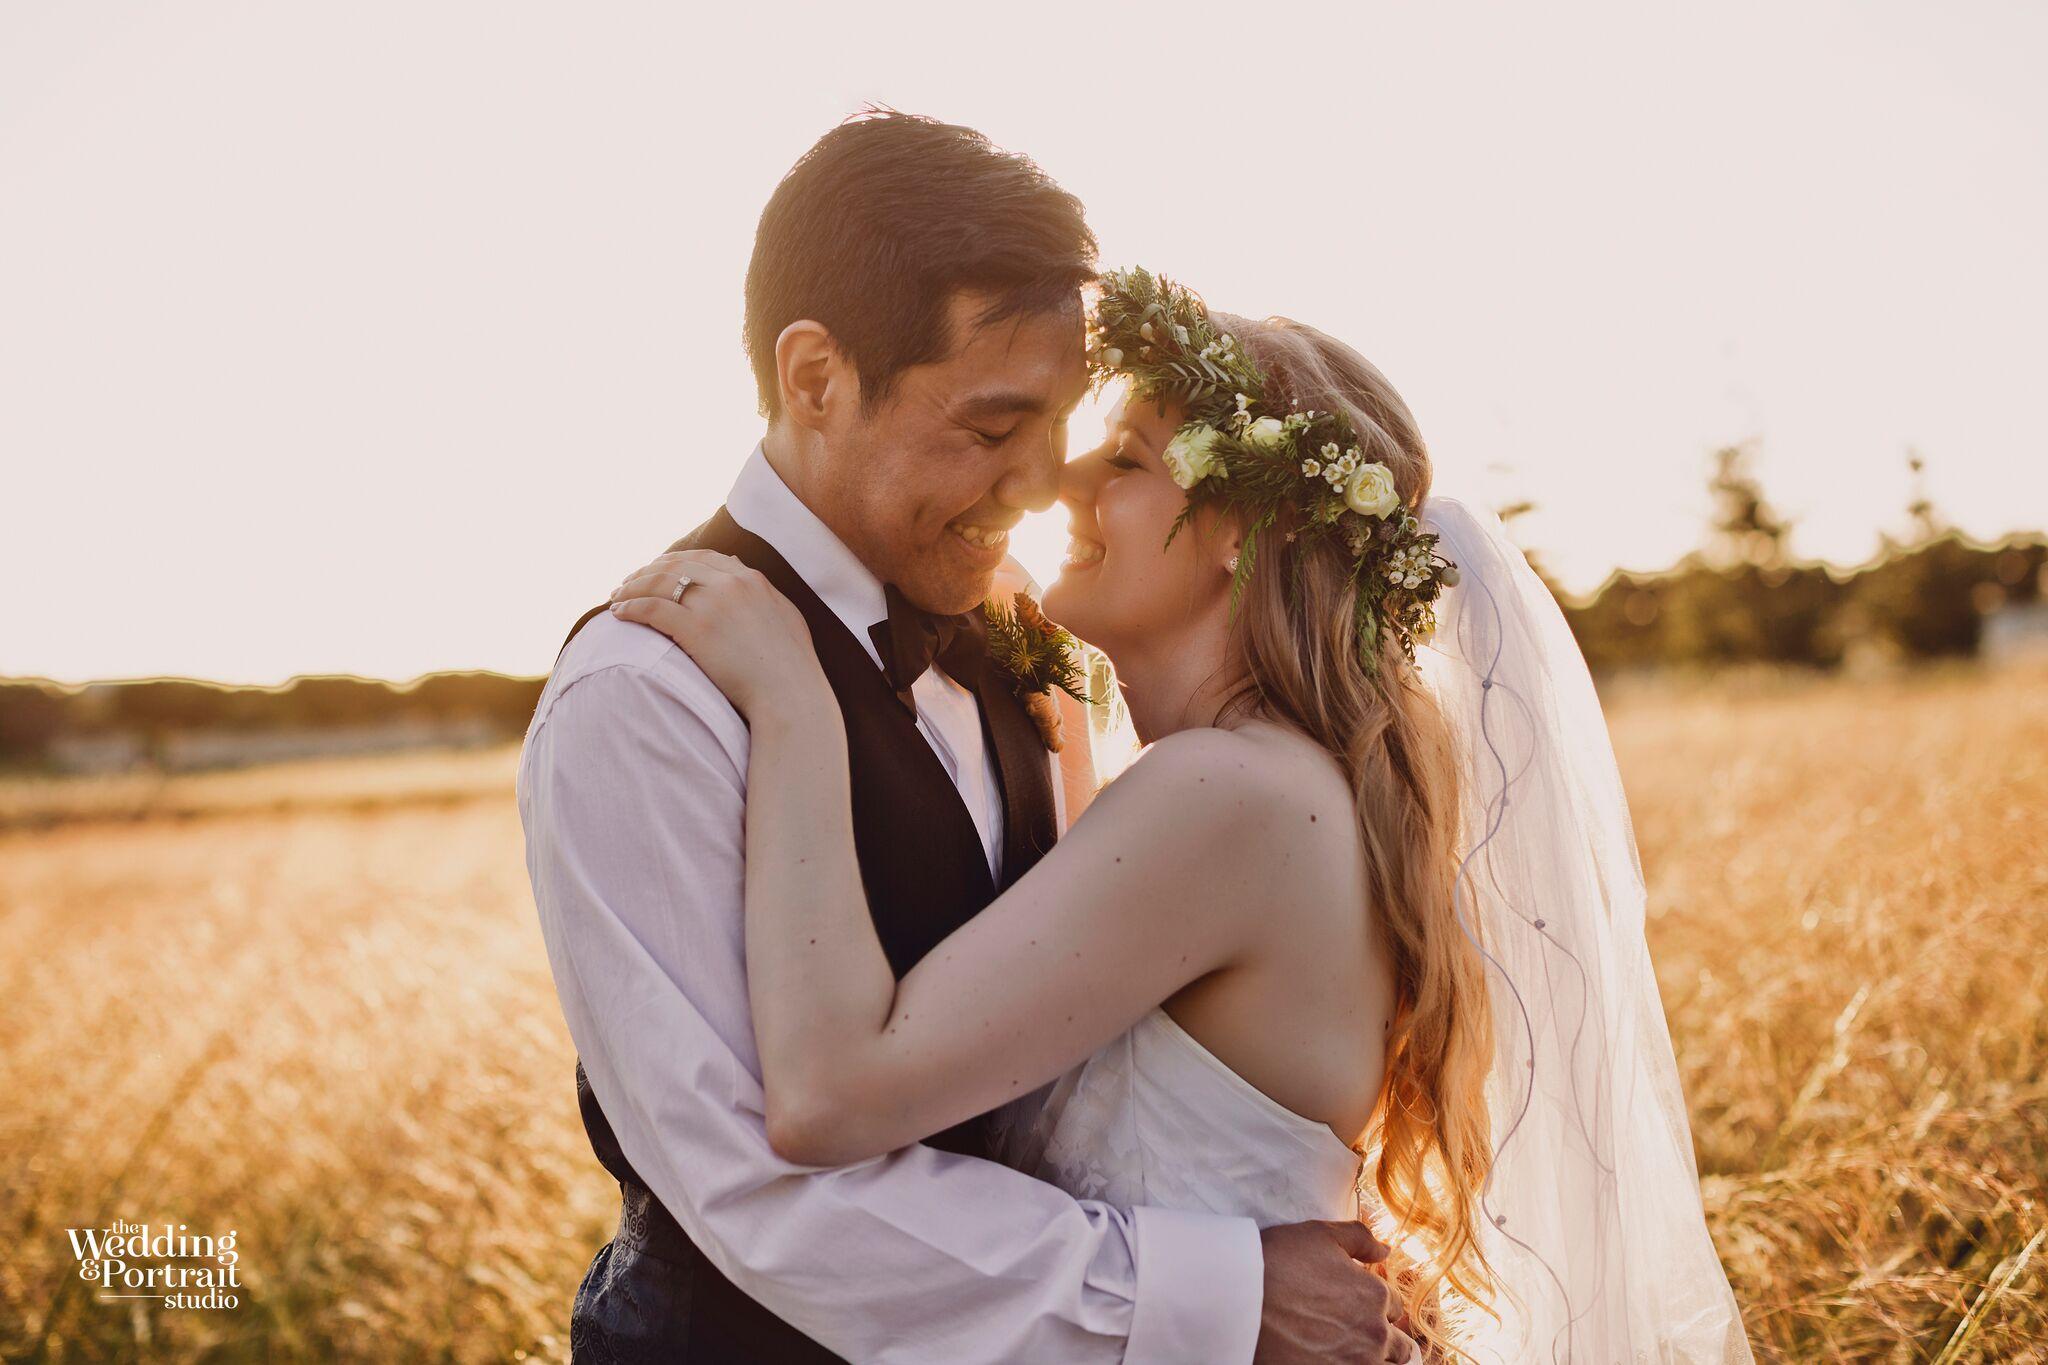 Sassy wedding portrait photography and make up